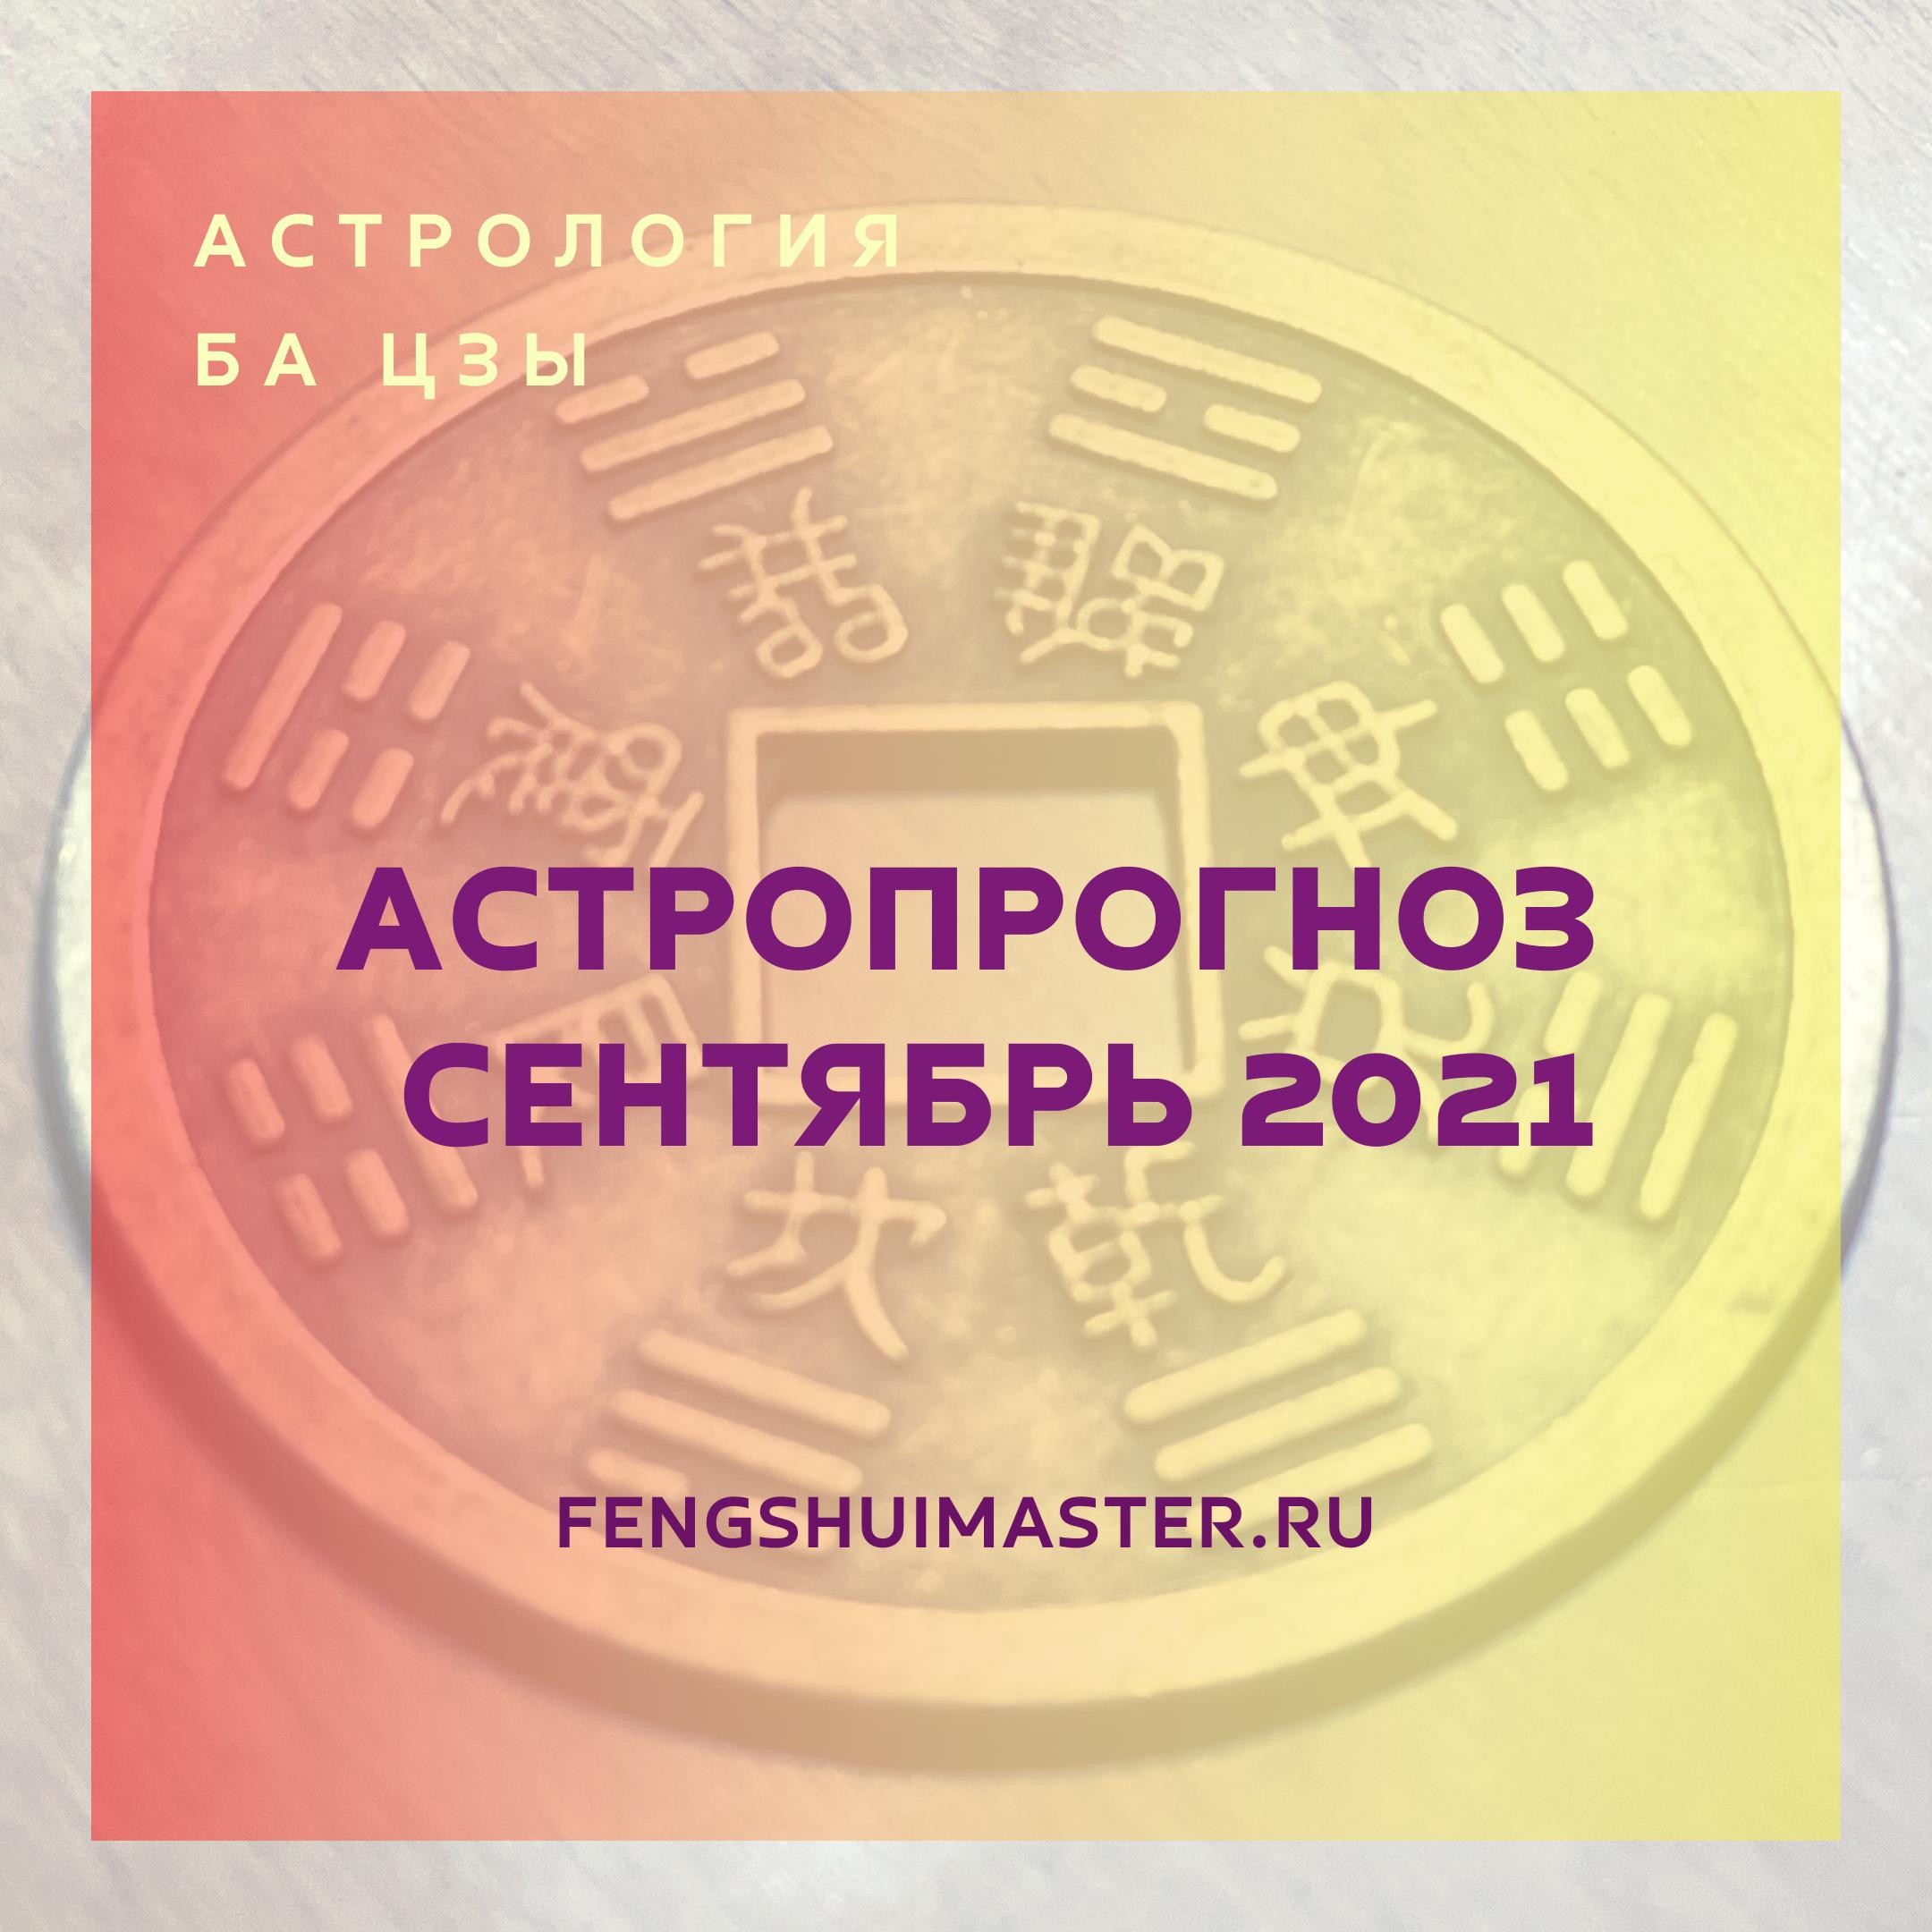 Астропрогноз • сентябрь 2021 • Fengshuimaster.Ru